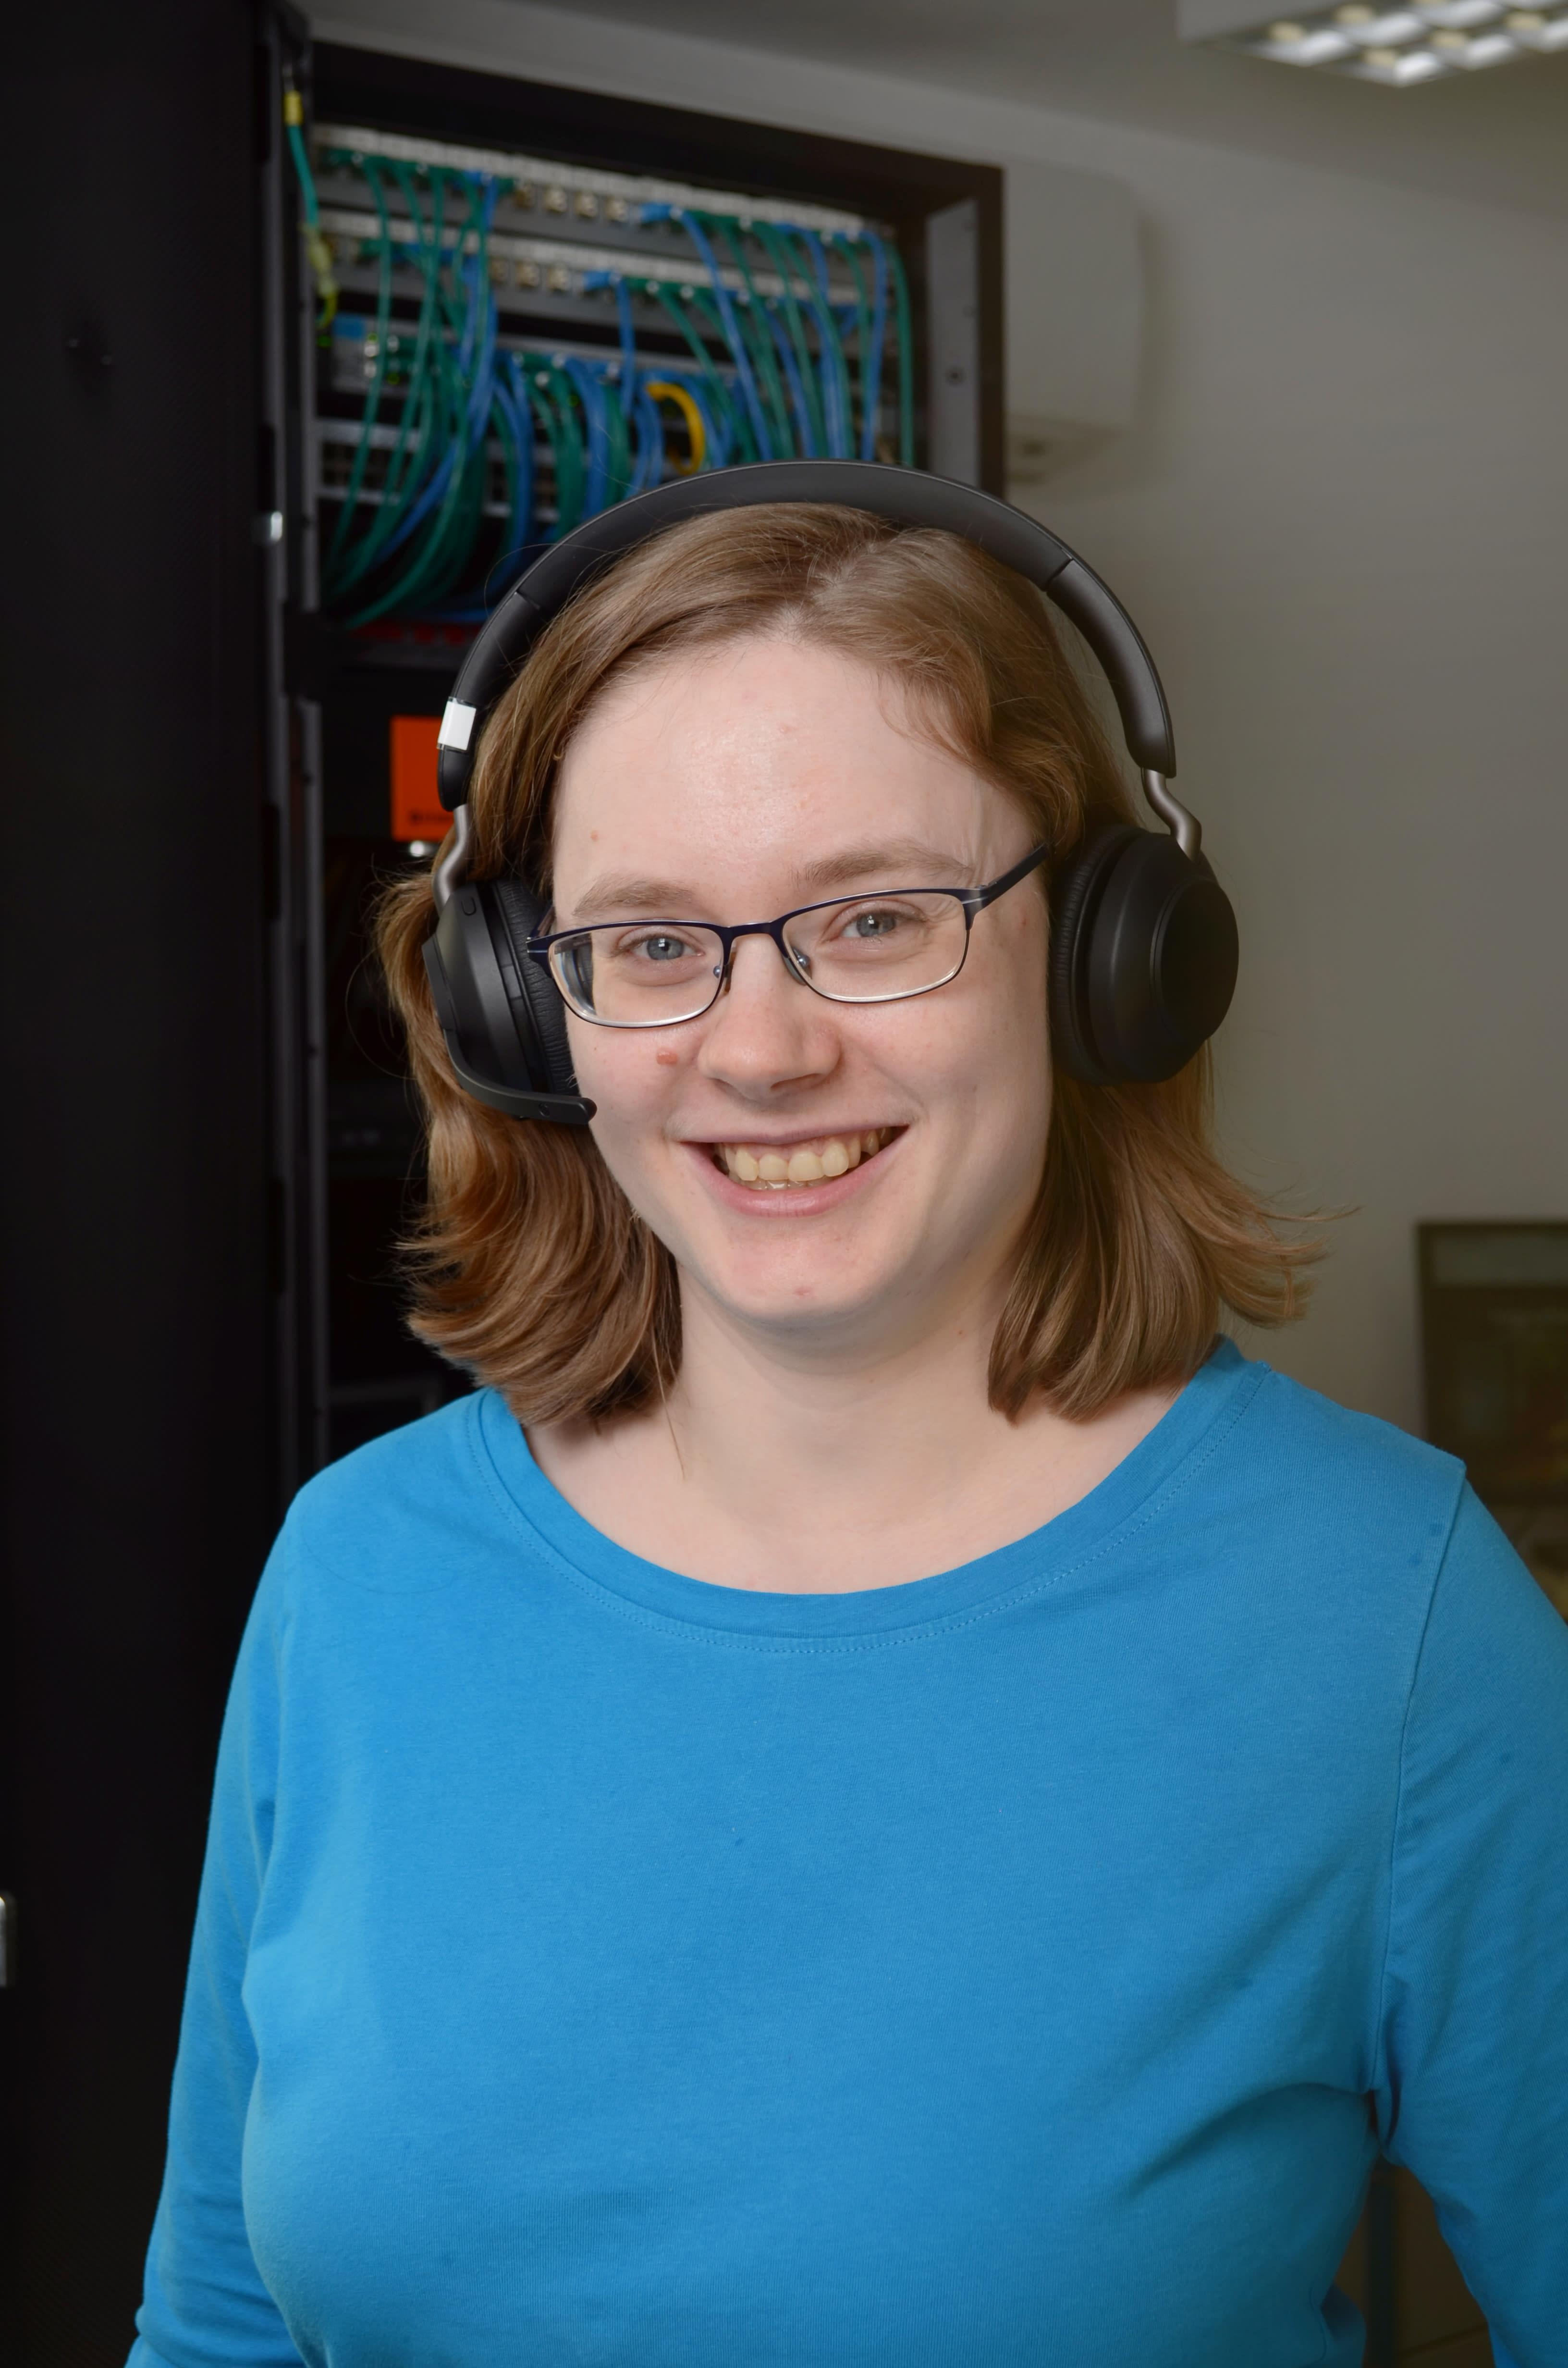 Franziska Bild mit Headset